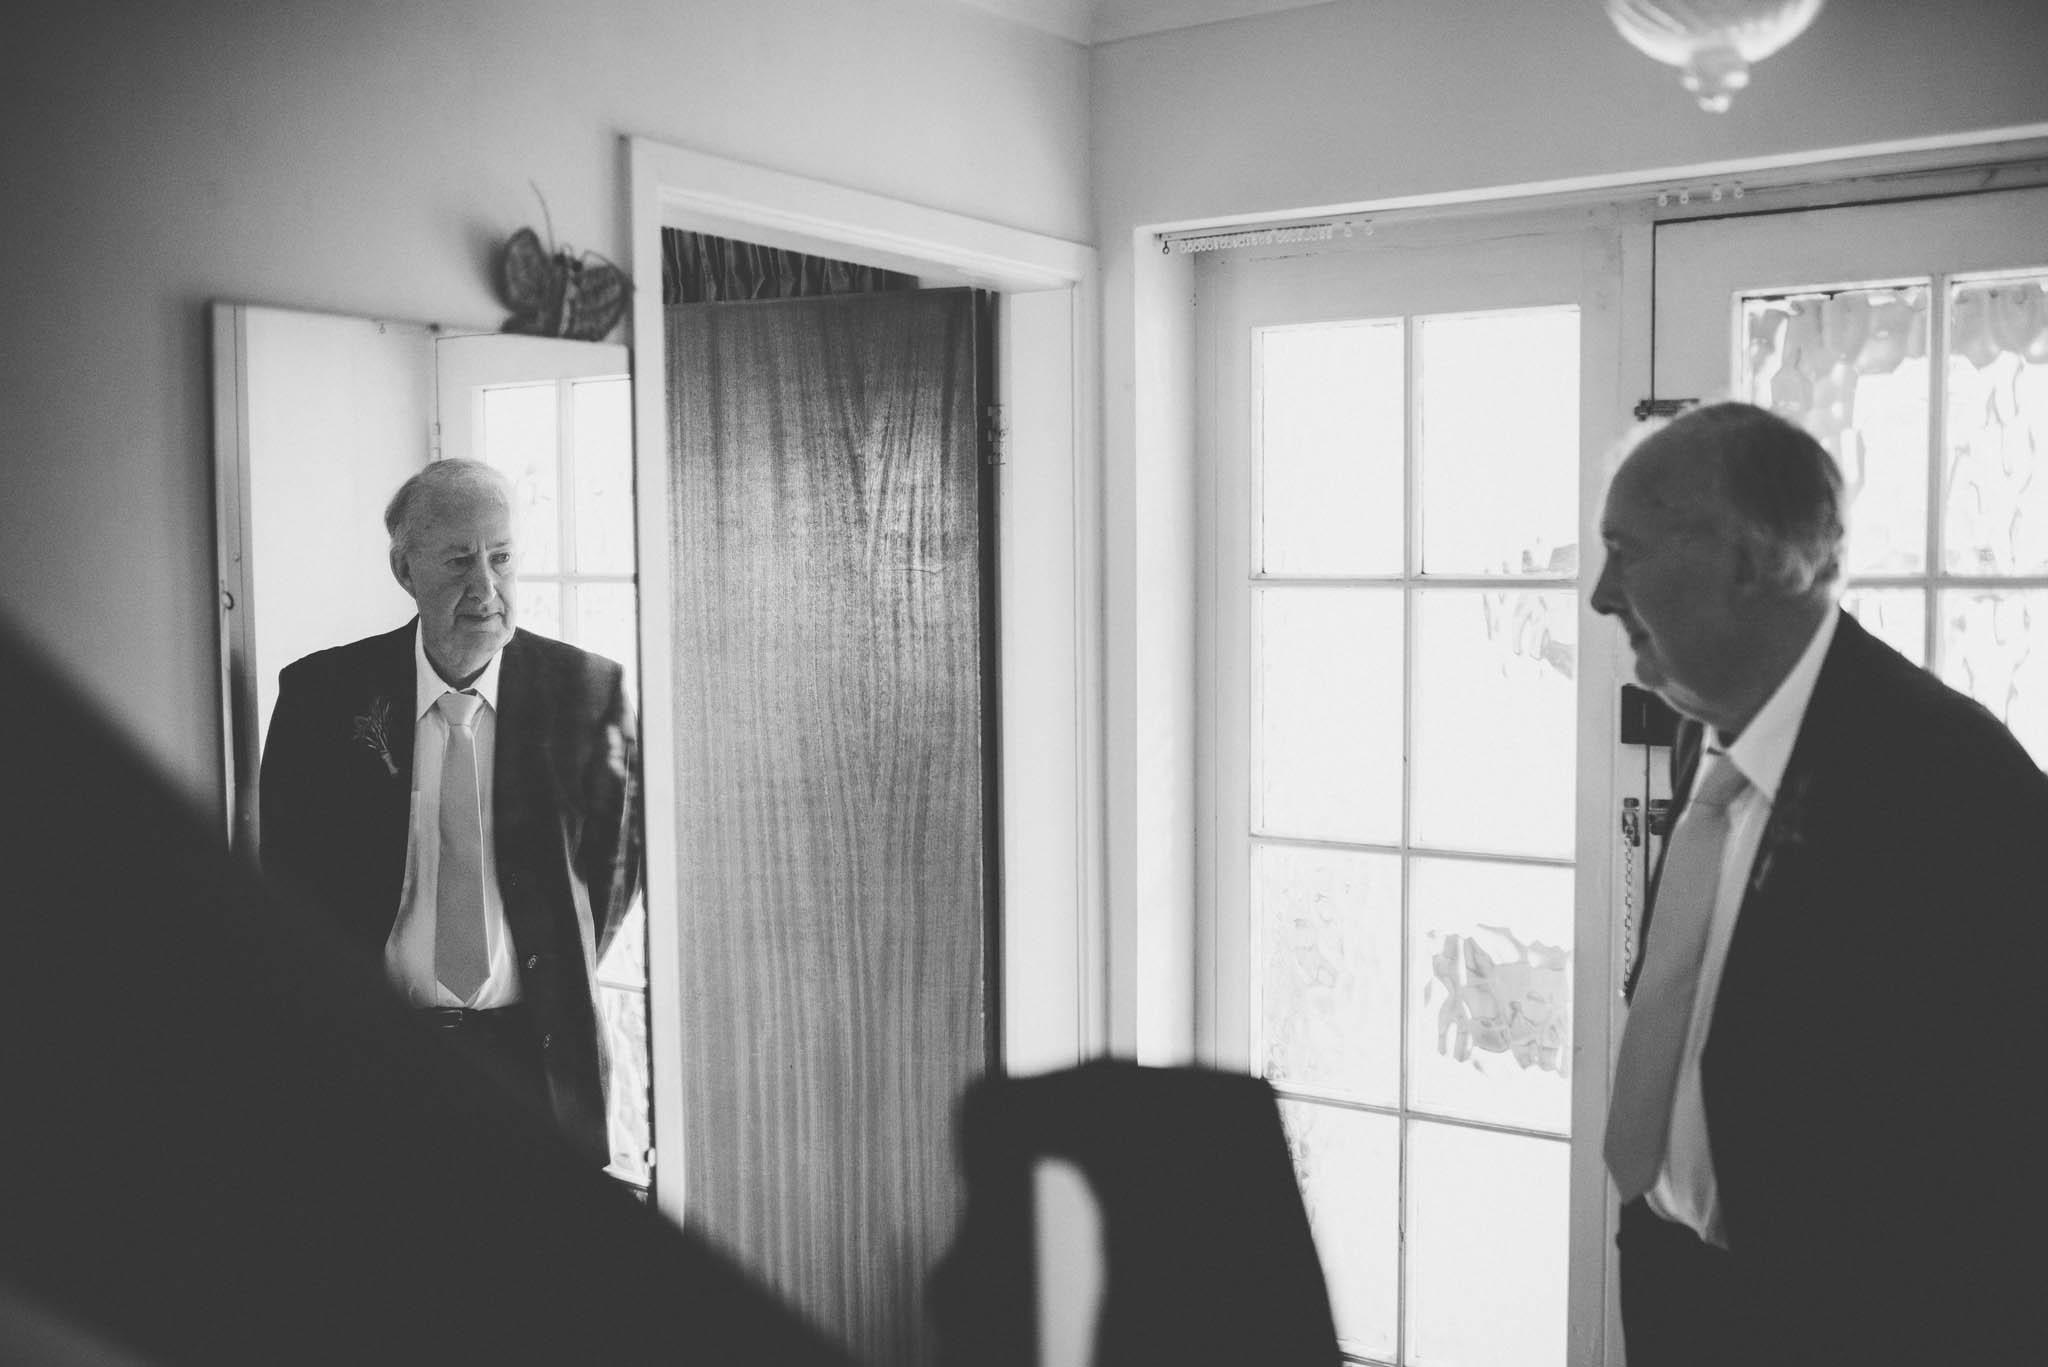 The-mirror-wedding-blog-scott-stockwell-photography-end-2017.jpg